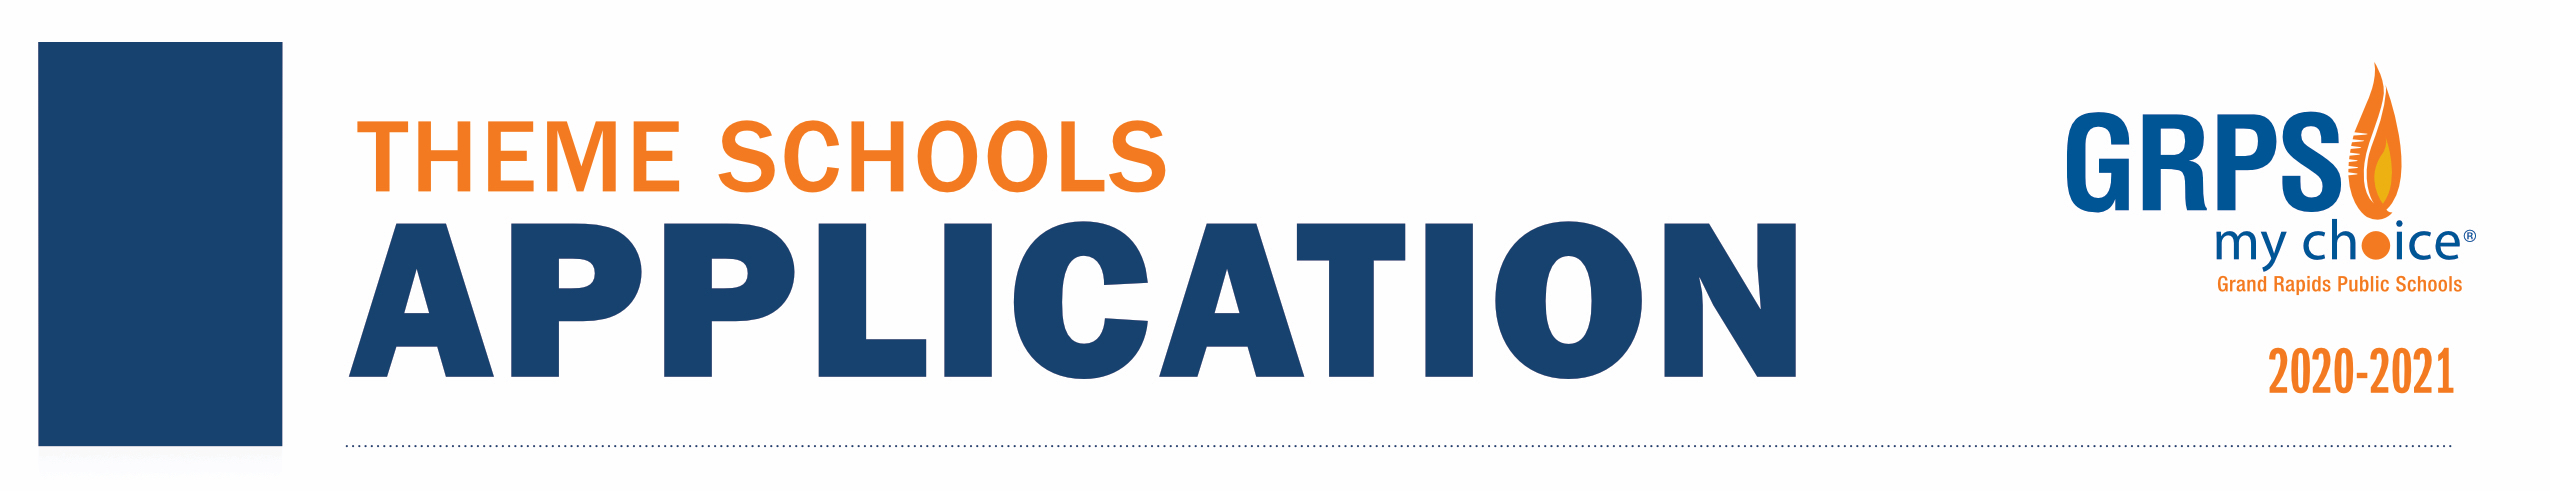 Applications & Enrollment Information Inside Grps School Calendar 2021